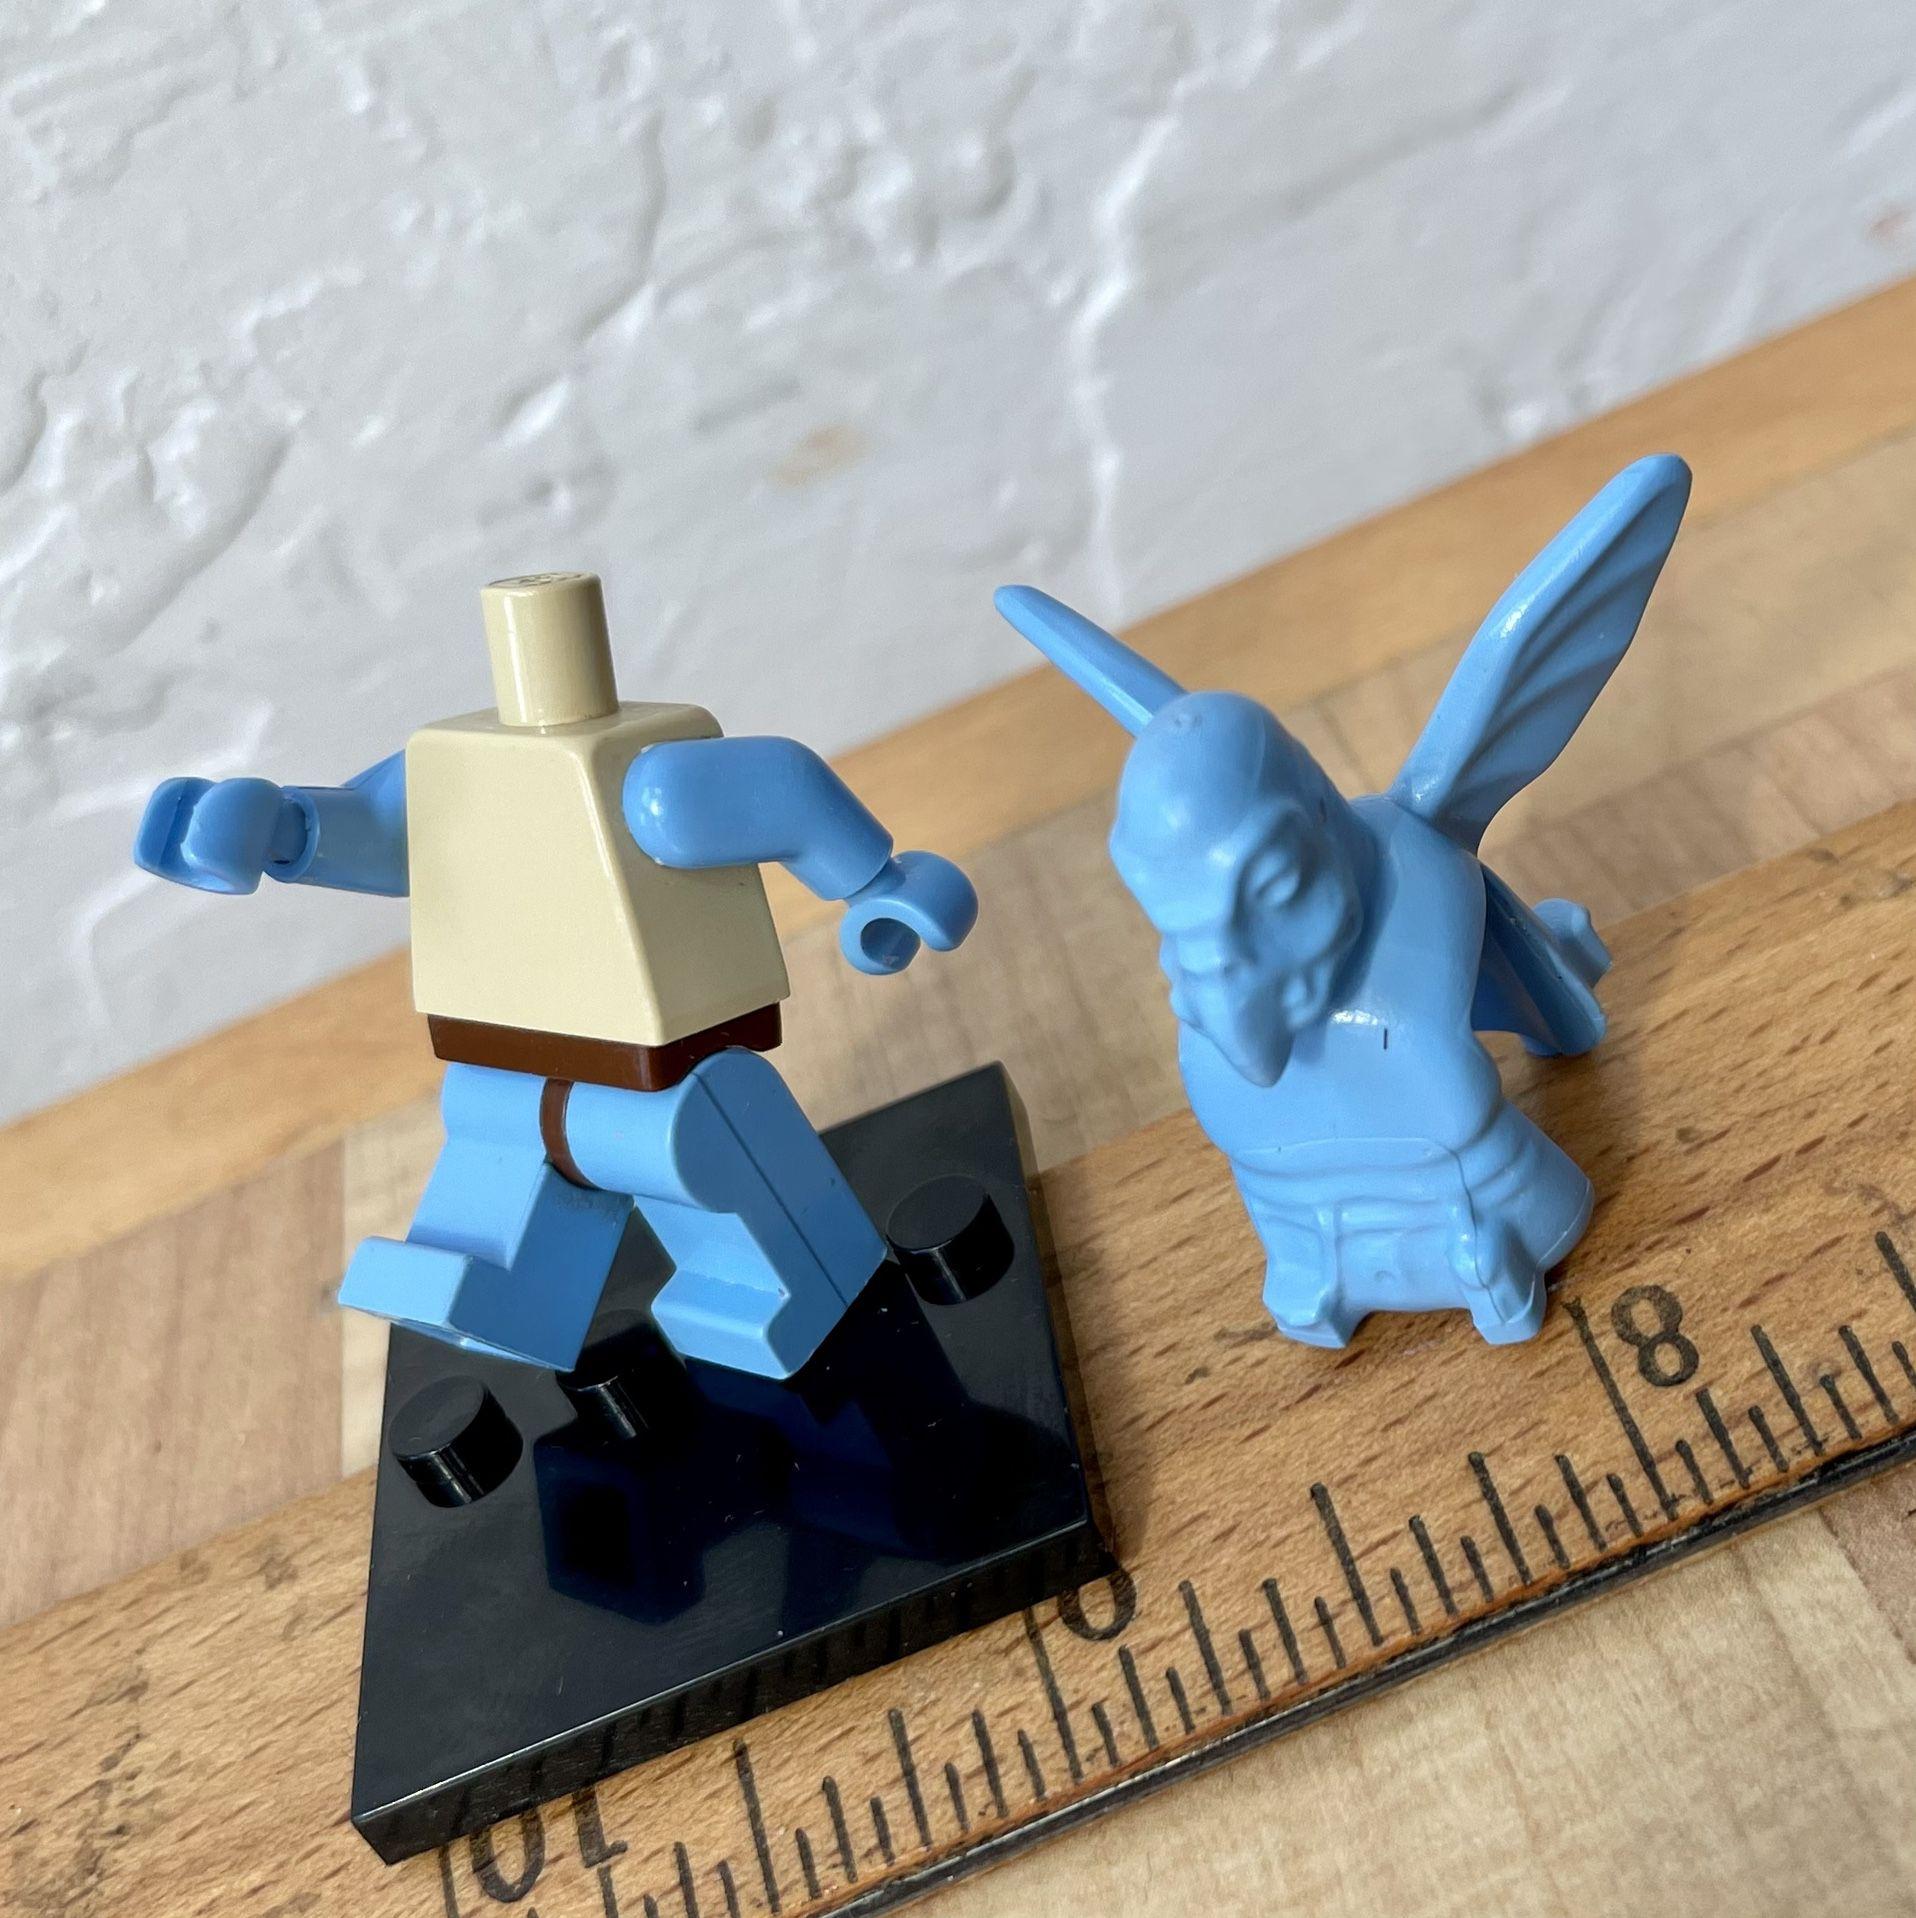 Vintage LEGO Star Wars Watto SW0038 Mini Figure From Watto's Junkyard Set #7186 Toy